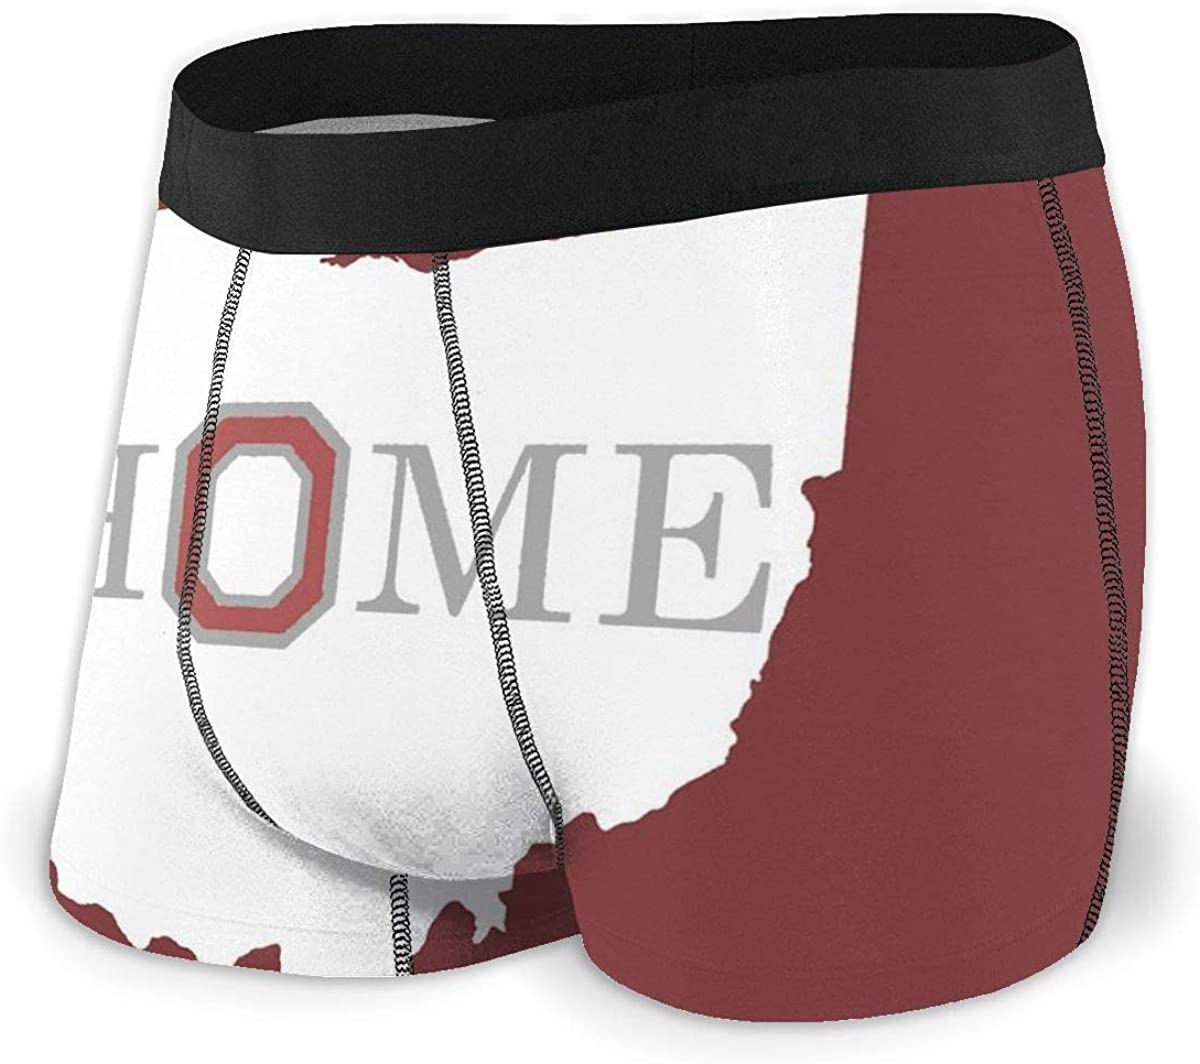 Men's Boxer Briefs Home Ohio State Underwear Trunks Comfortable Training Classic Moisture Wicking Bikini Panties